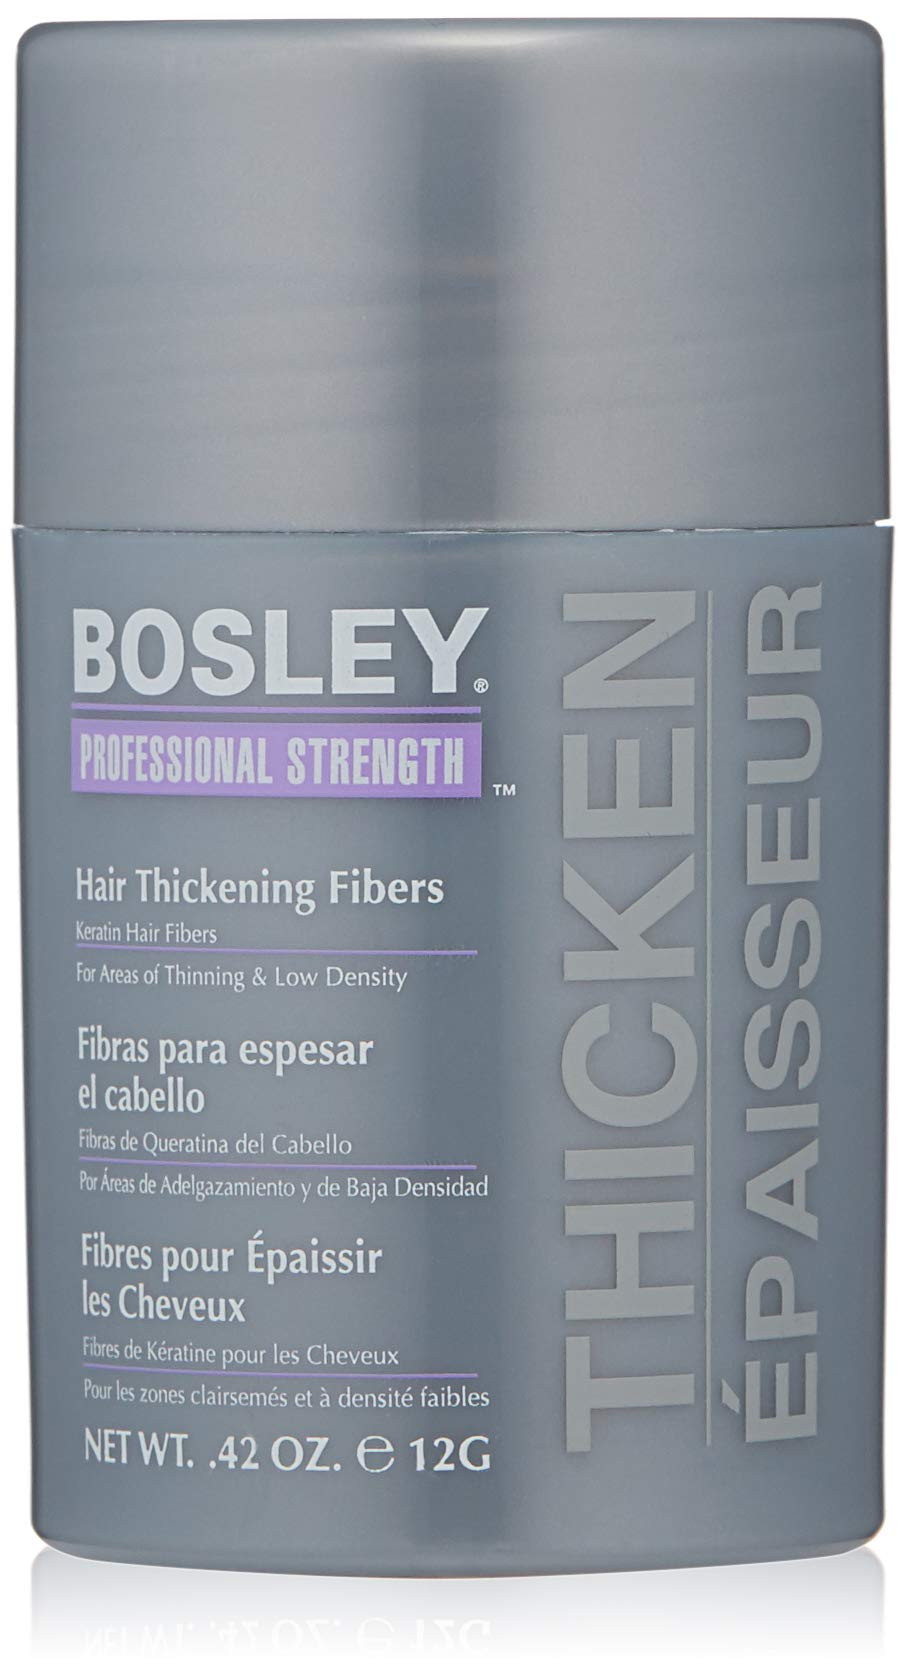 Bosley Professional Strength Hair Thickening Fibers, Light Brown, 0.42 Ounce by Bosley Professional Strength